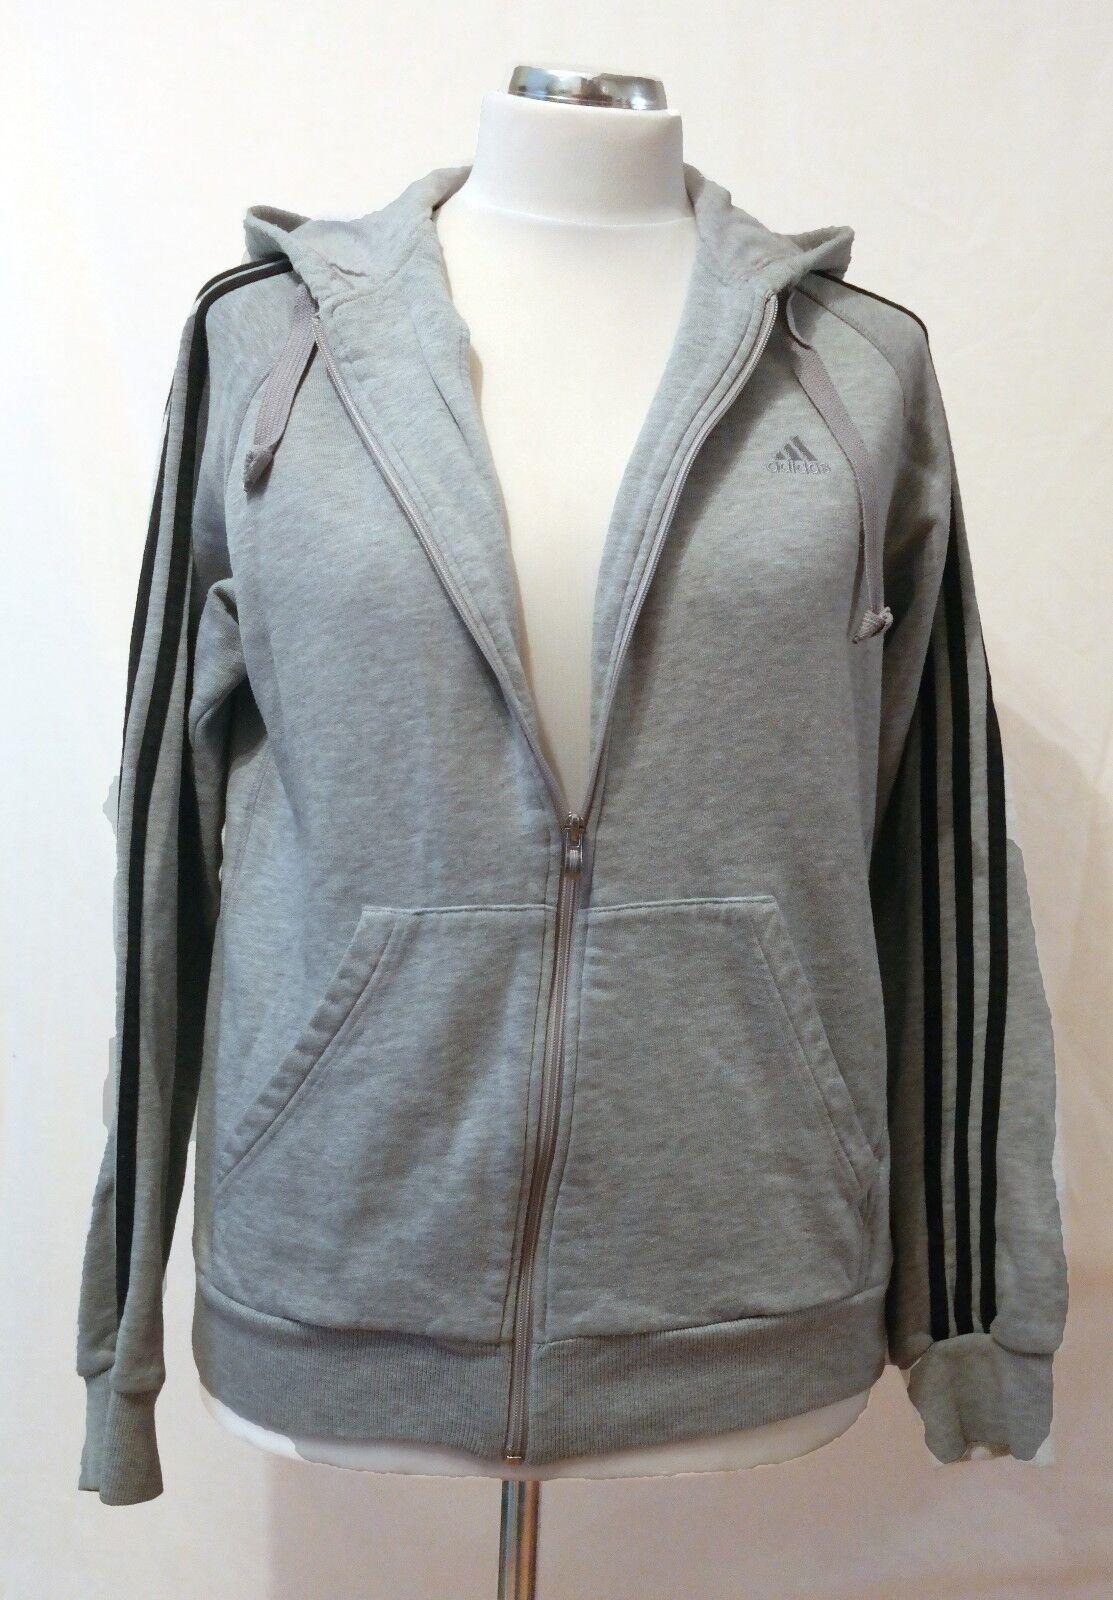 Adidas Mens Full Zip 3 Stripe Hooded Sweatshirt Sweatshirt Sweatshirt grau Größe Large | Qualitätskönigin  d607b9